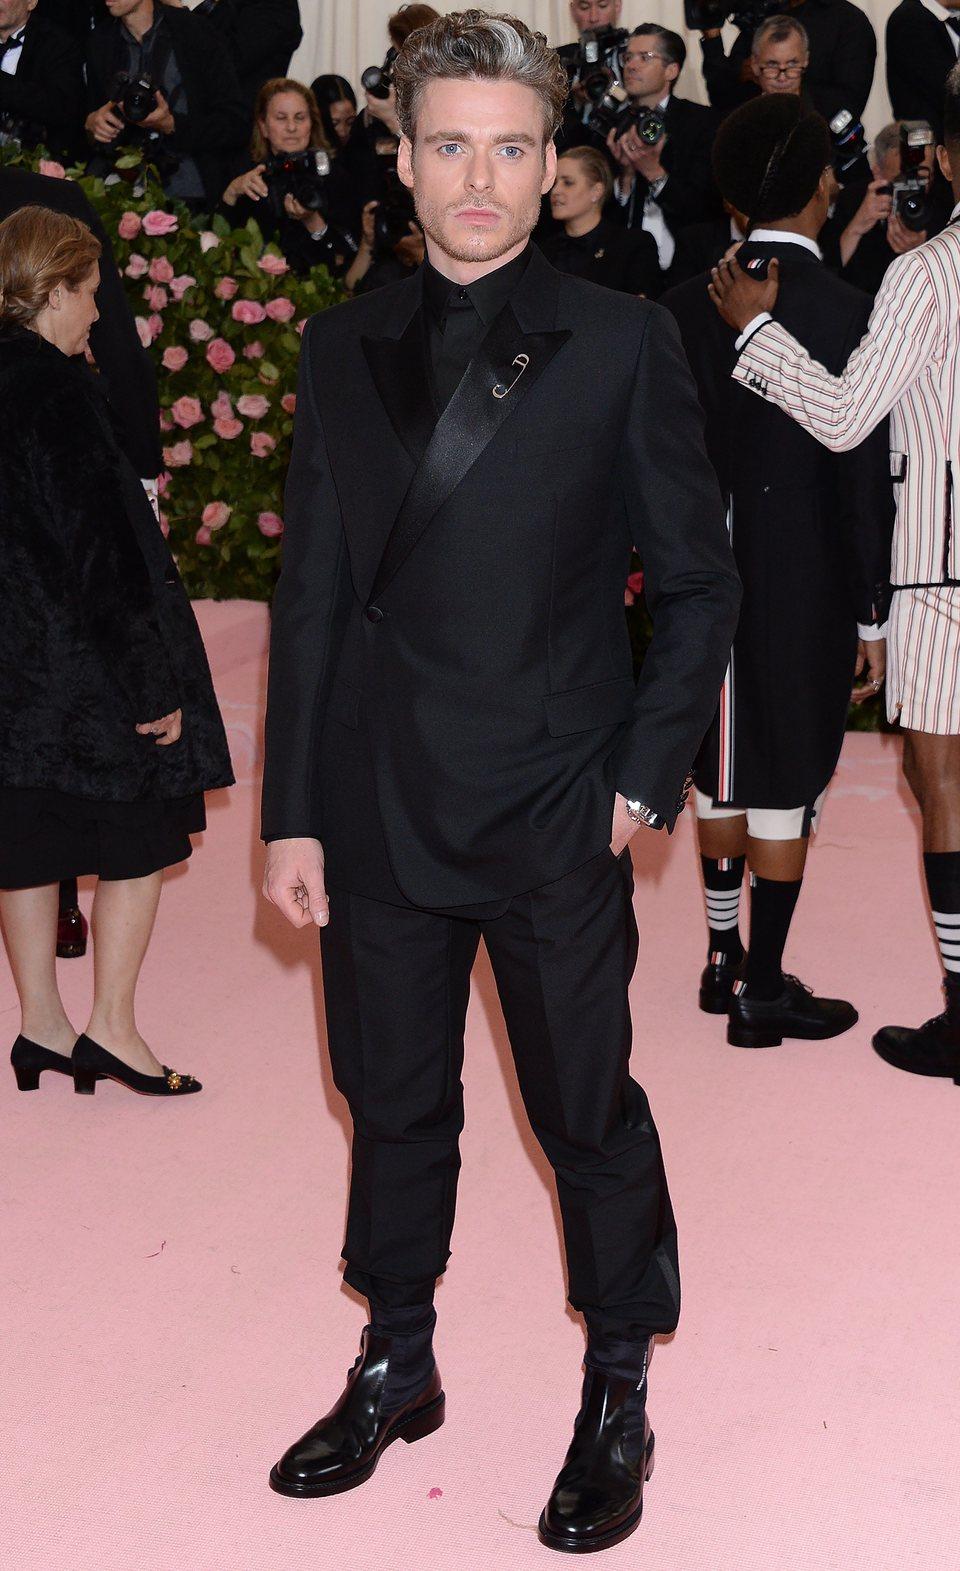 Richard Madden at Met Gala 2019